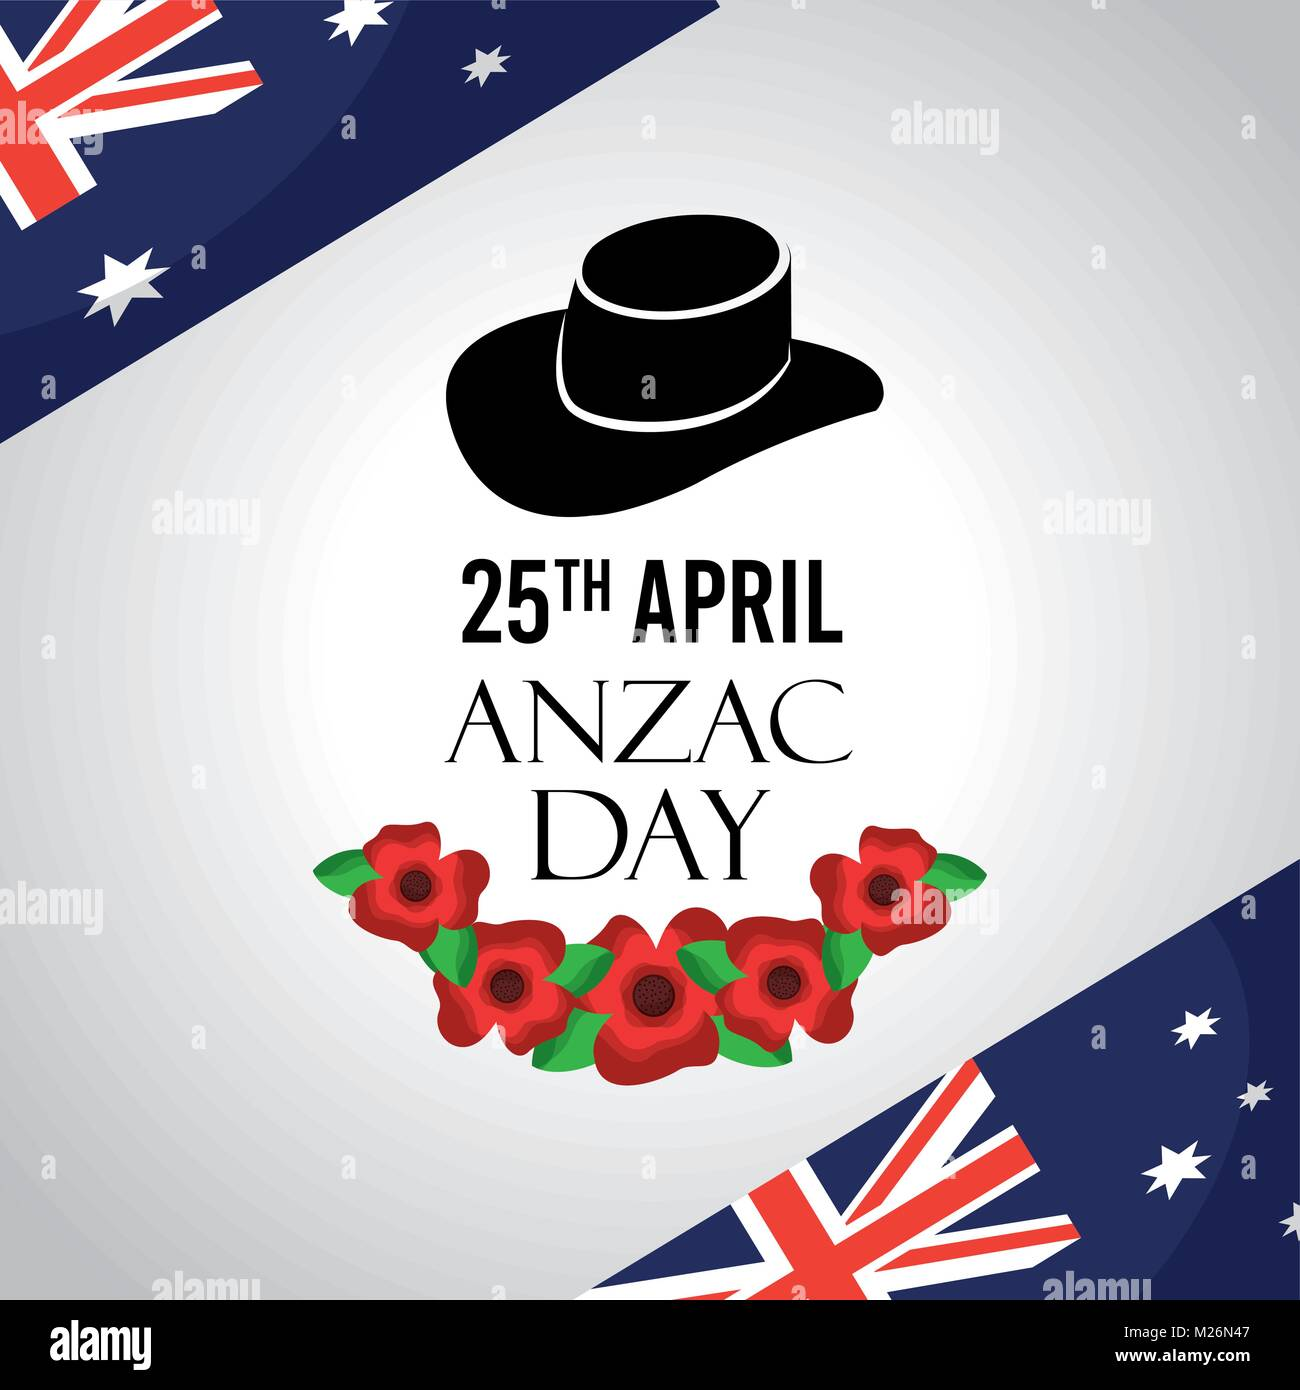 173a6d1dd7 anzac day celebration card flags australian hat commemoration - Stock Image